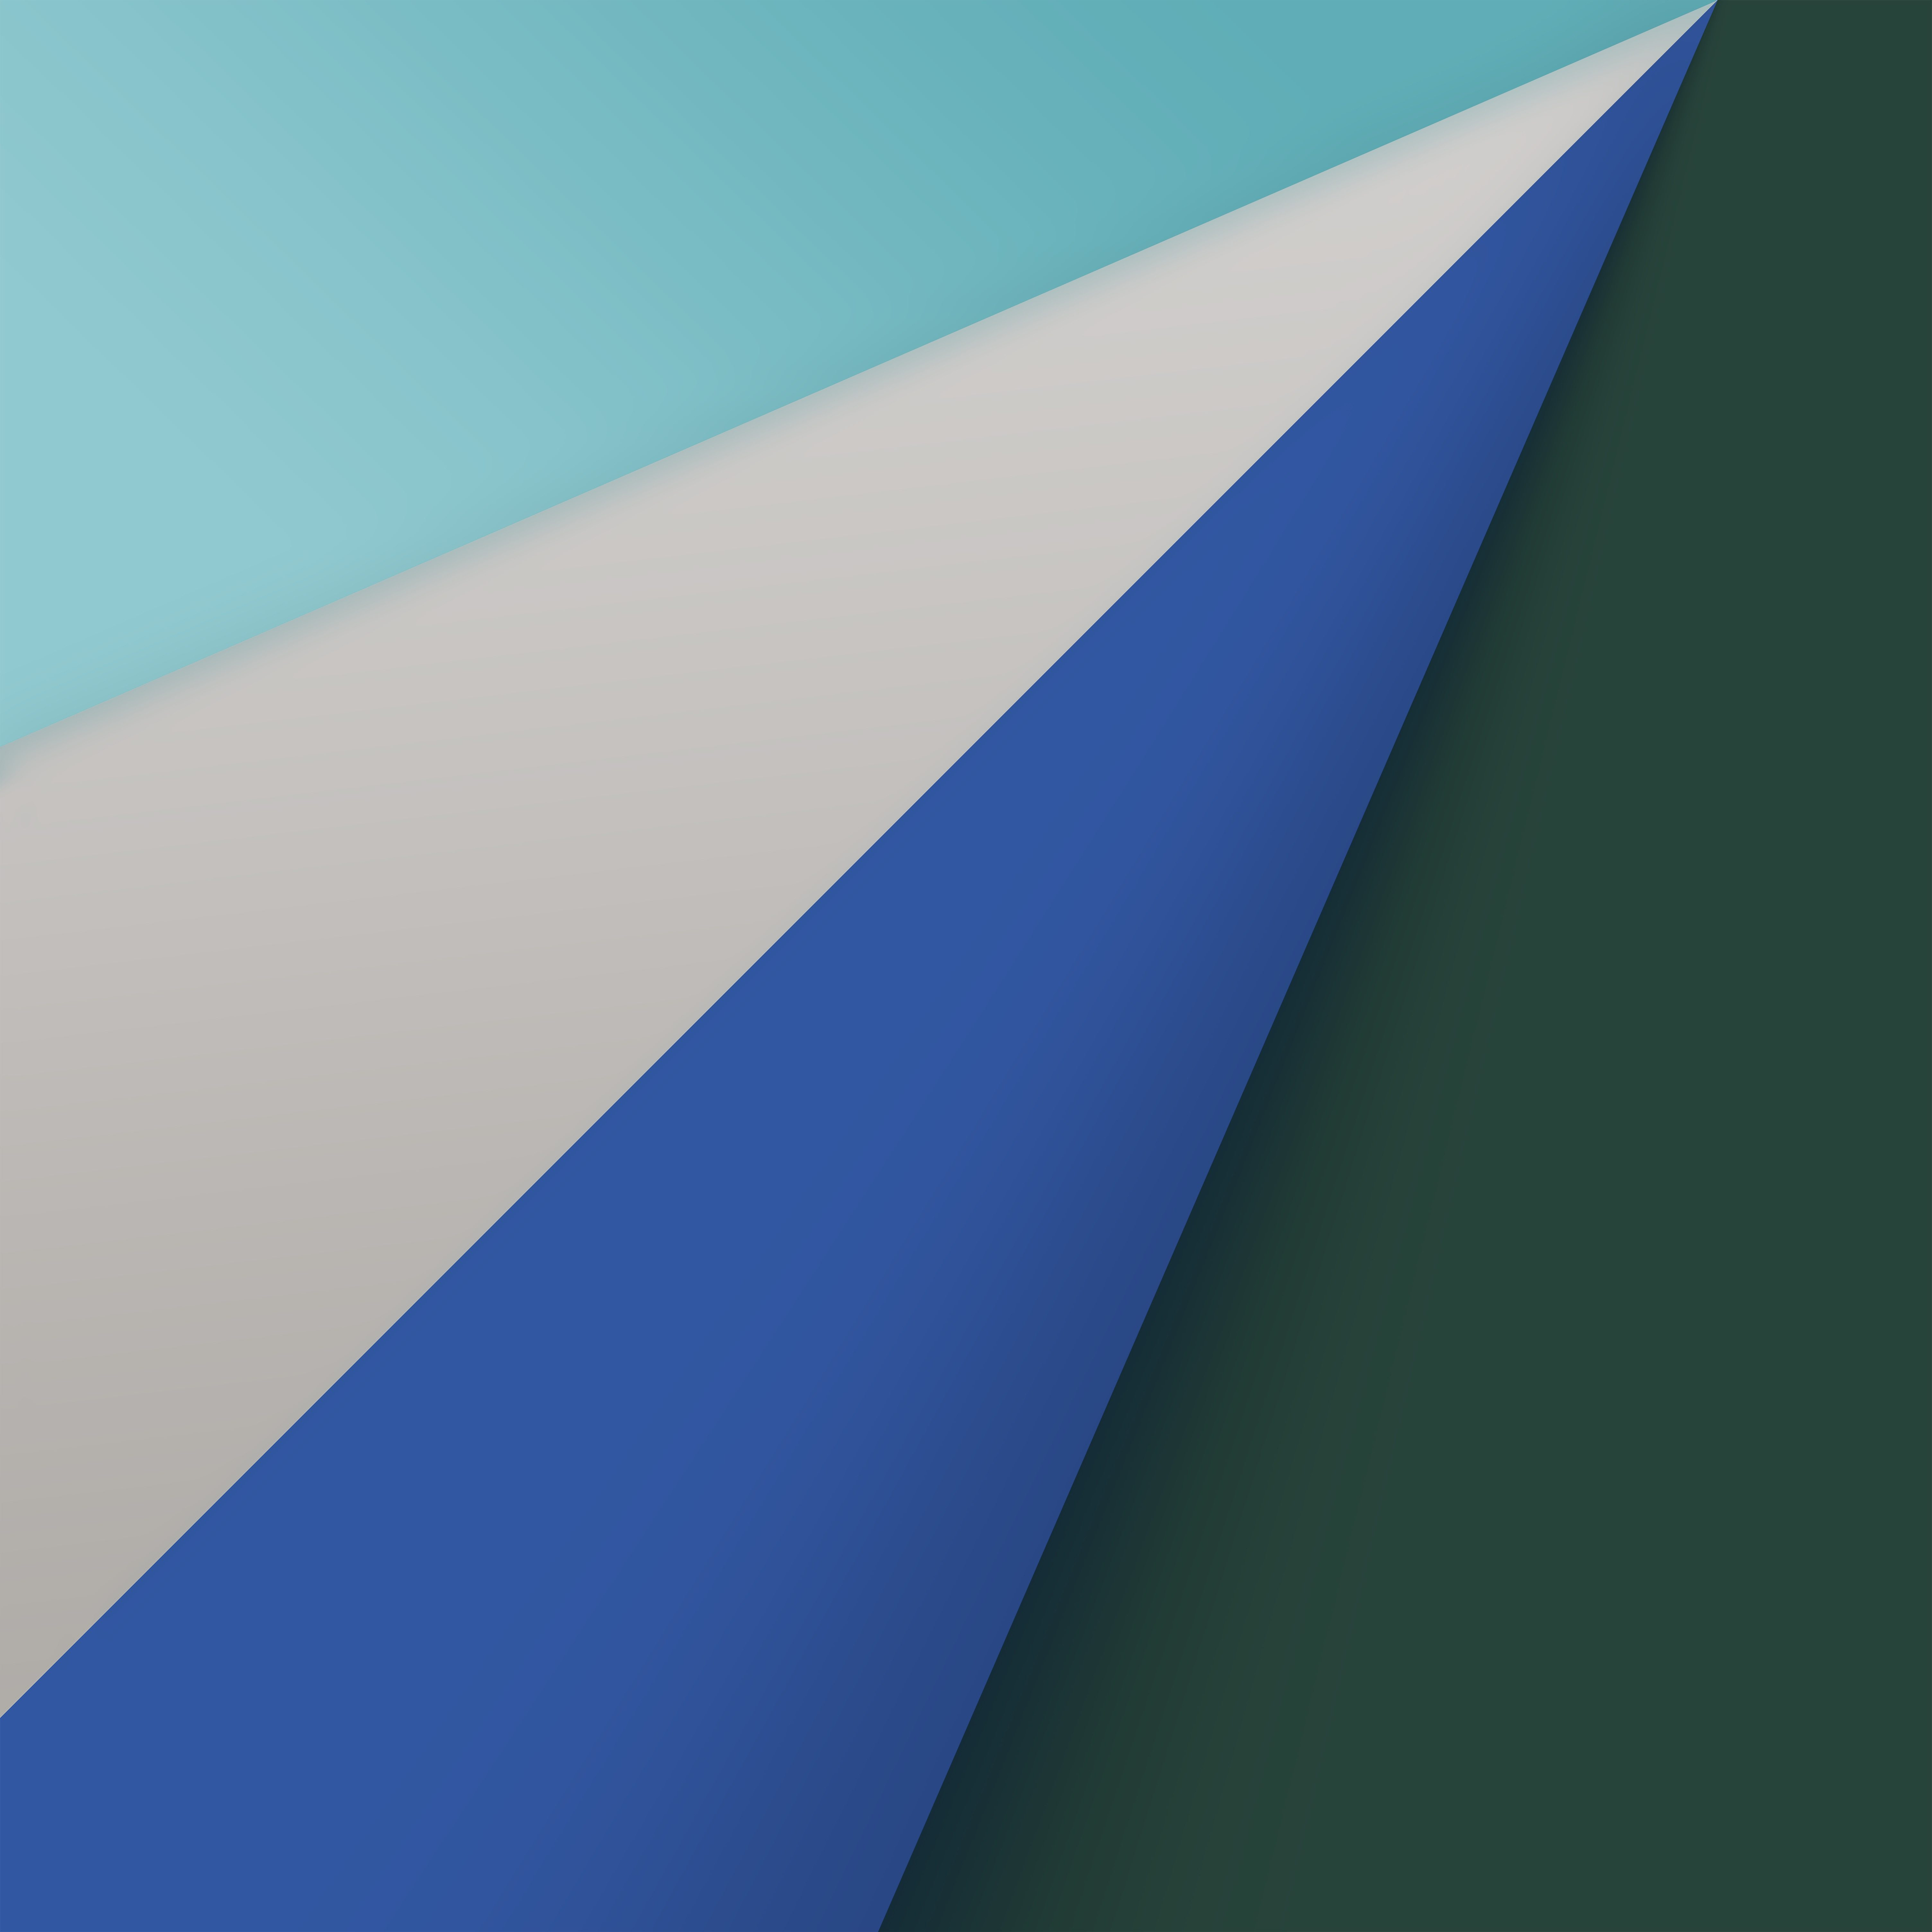 Safari Wallpaper AR72014 iDownloadBlog iPad Desktop Blue